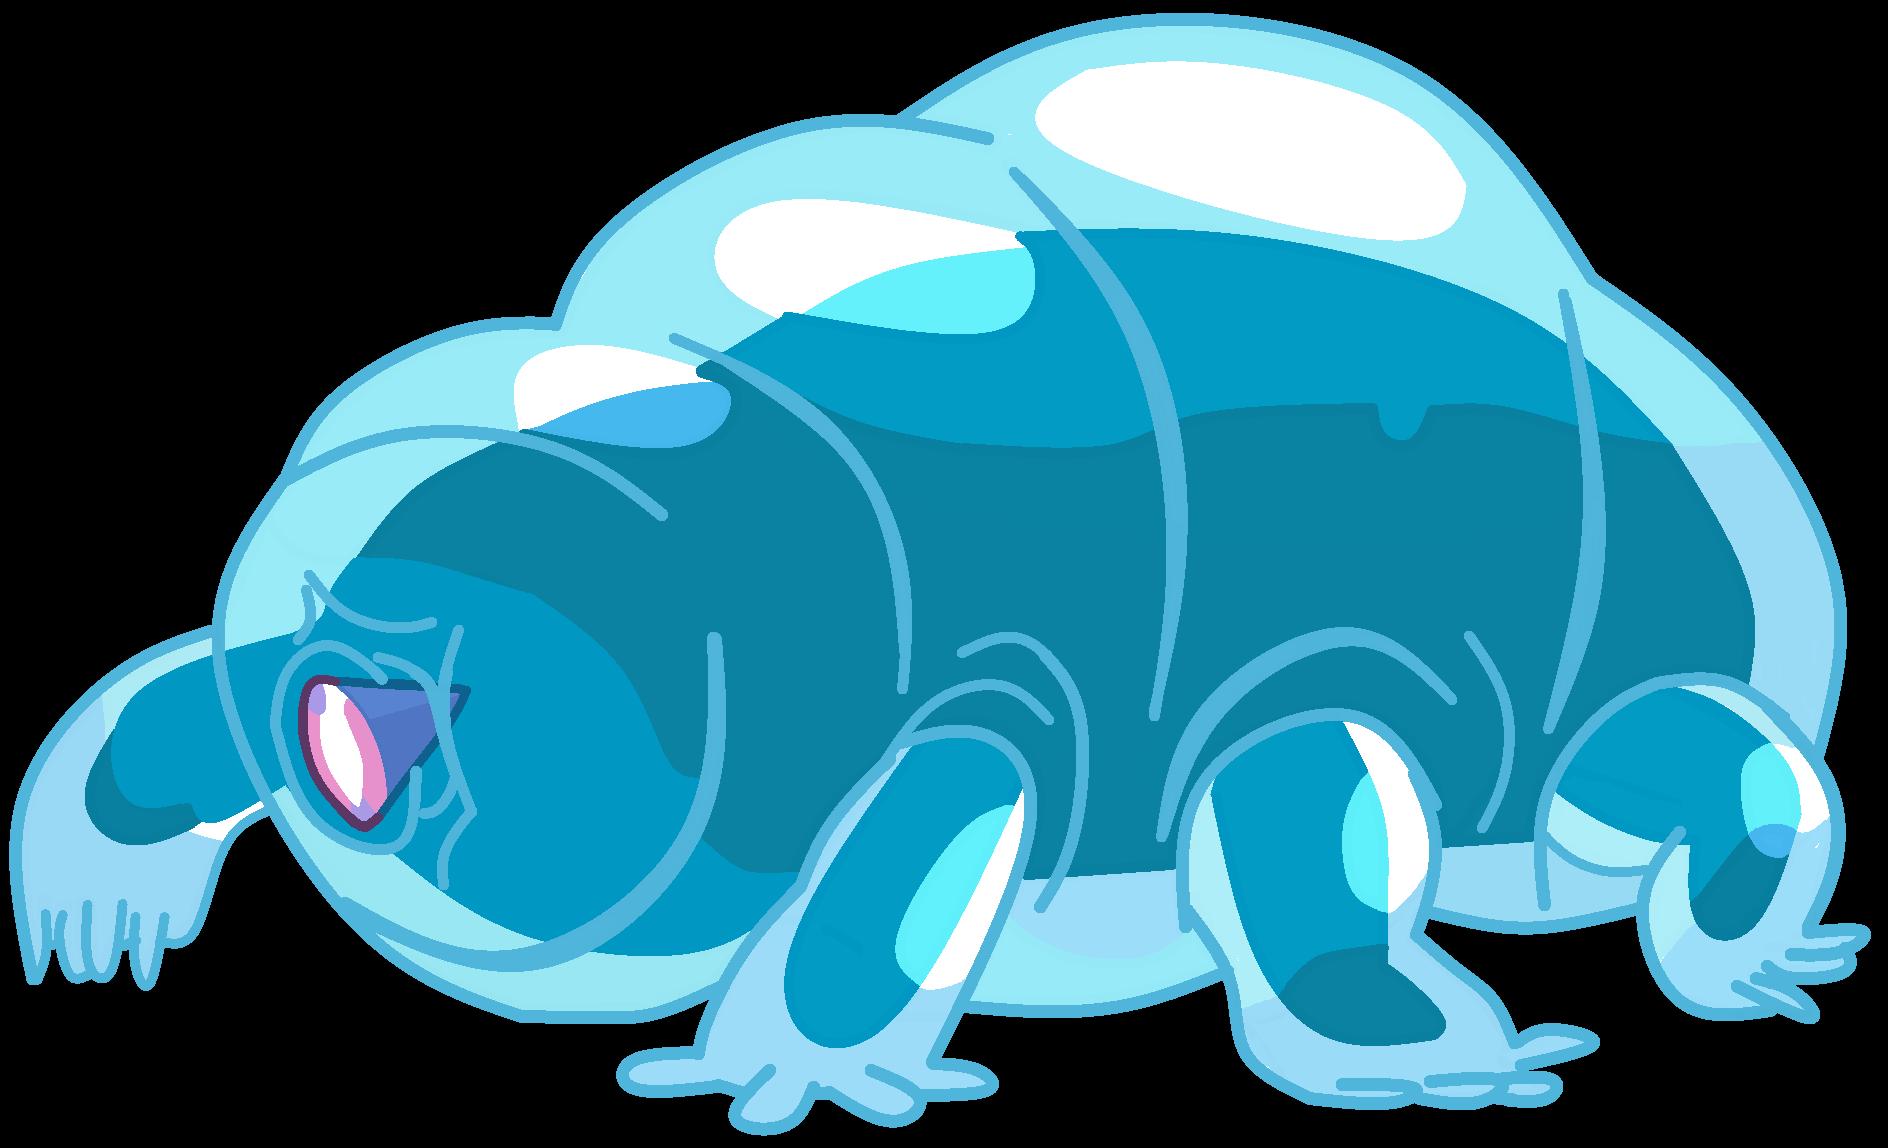 Manatee clipart tardigrade, Manatee tardigrade Transparent.